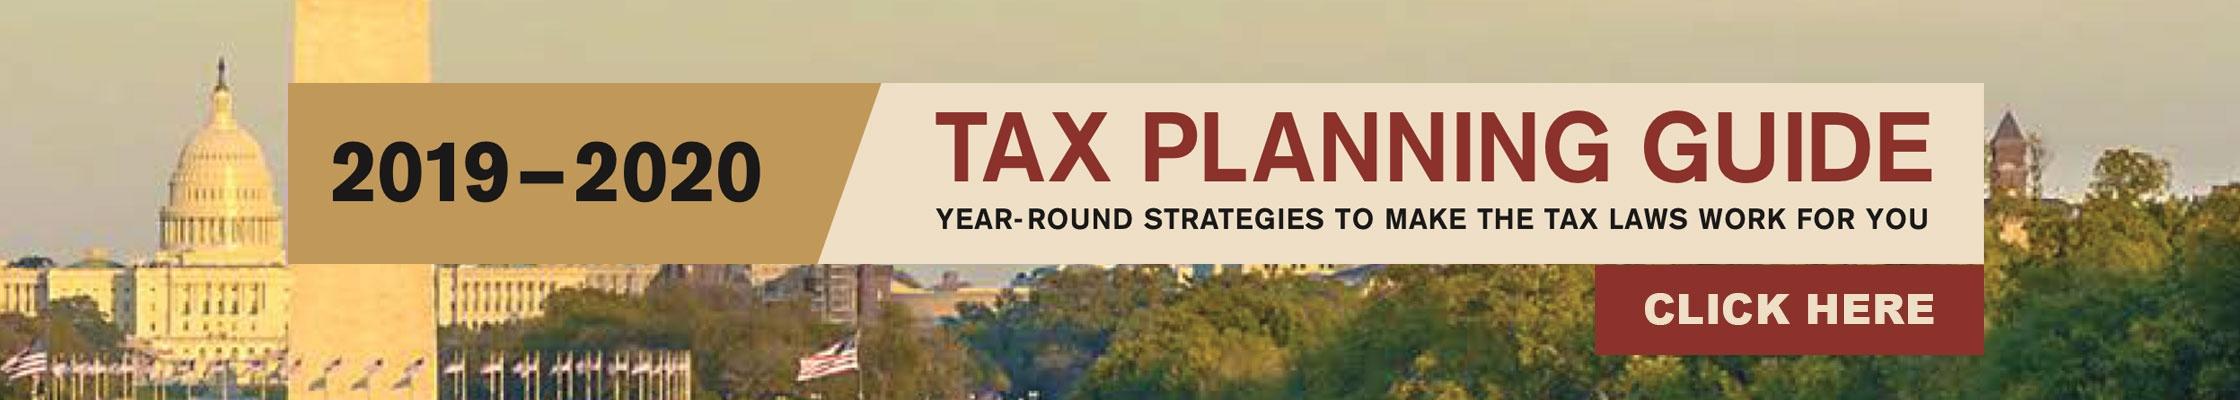 2019-20-taxplanningguide